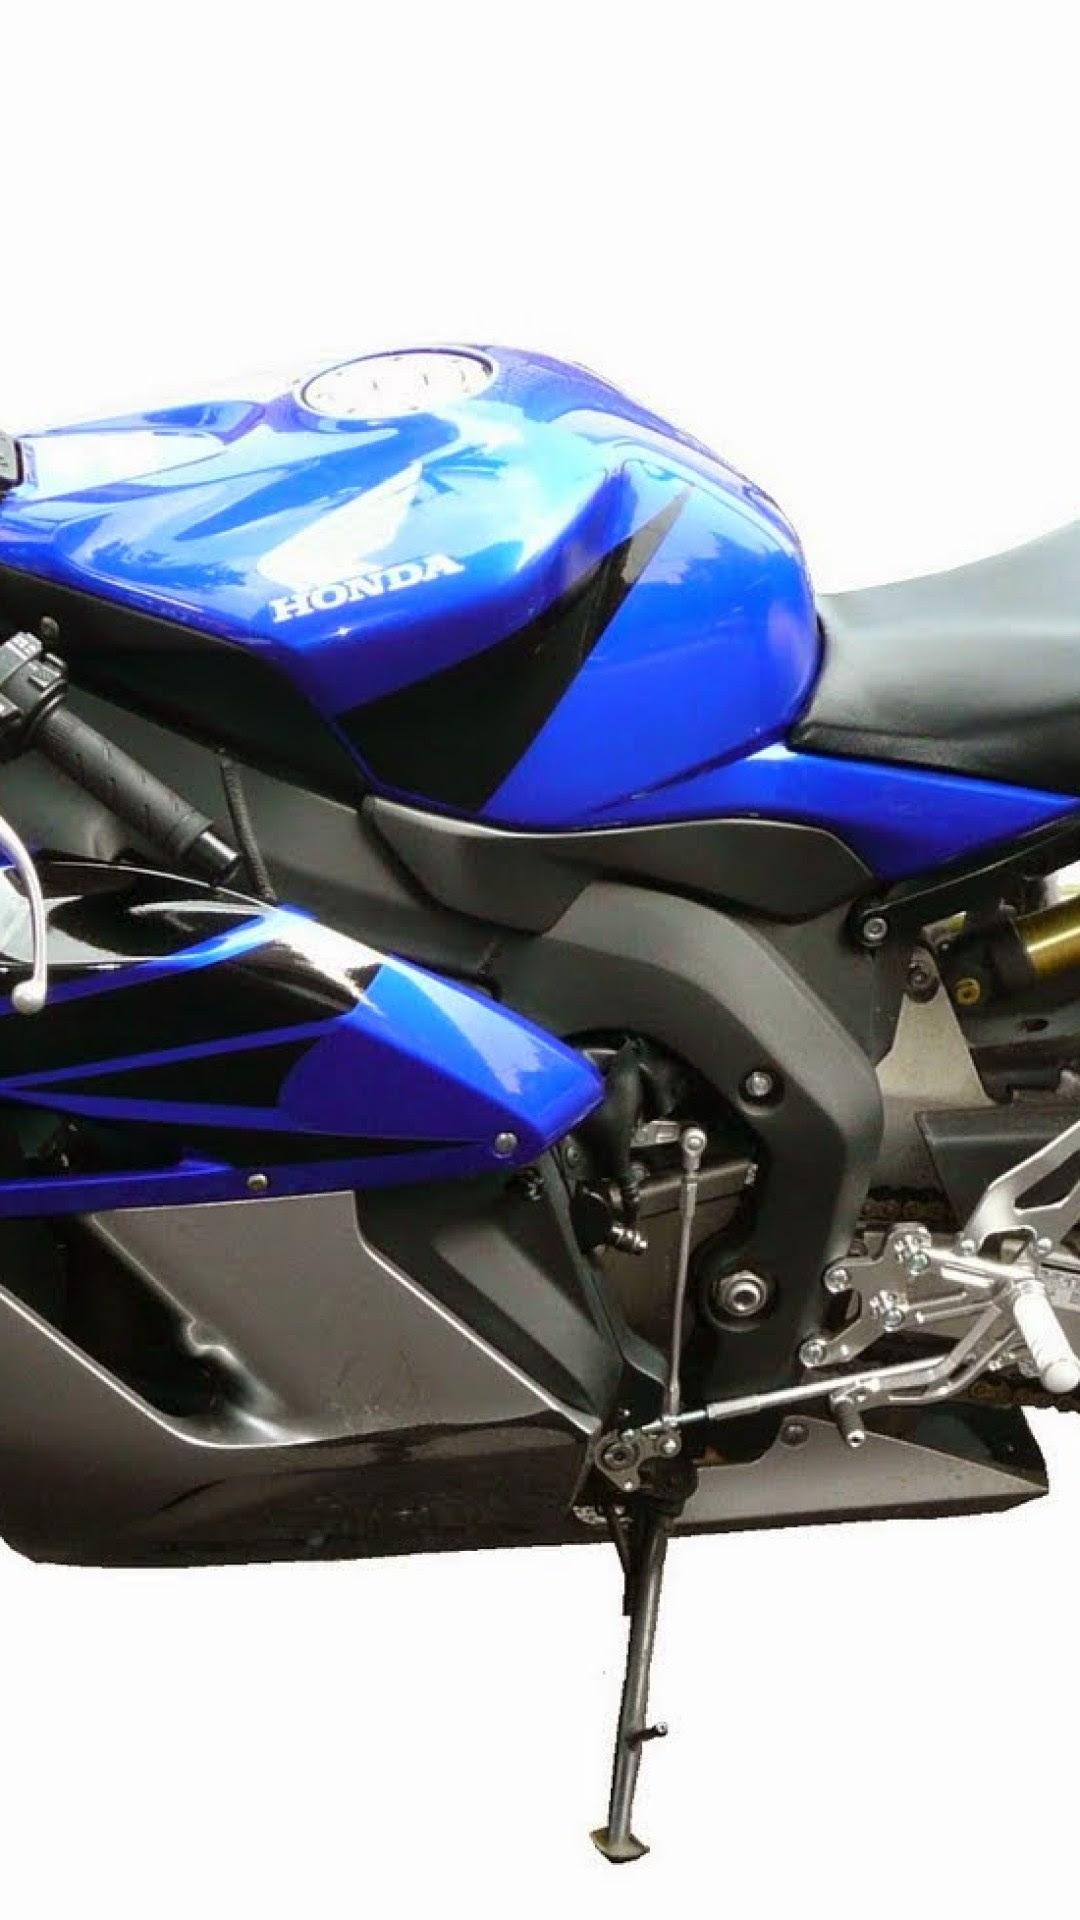 Modifikasi Motor Honda Cbr 150 Old Kumpulan Modifikasi Motor